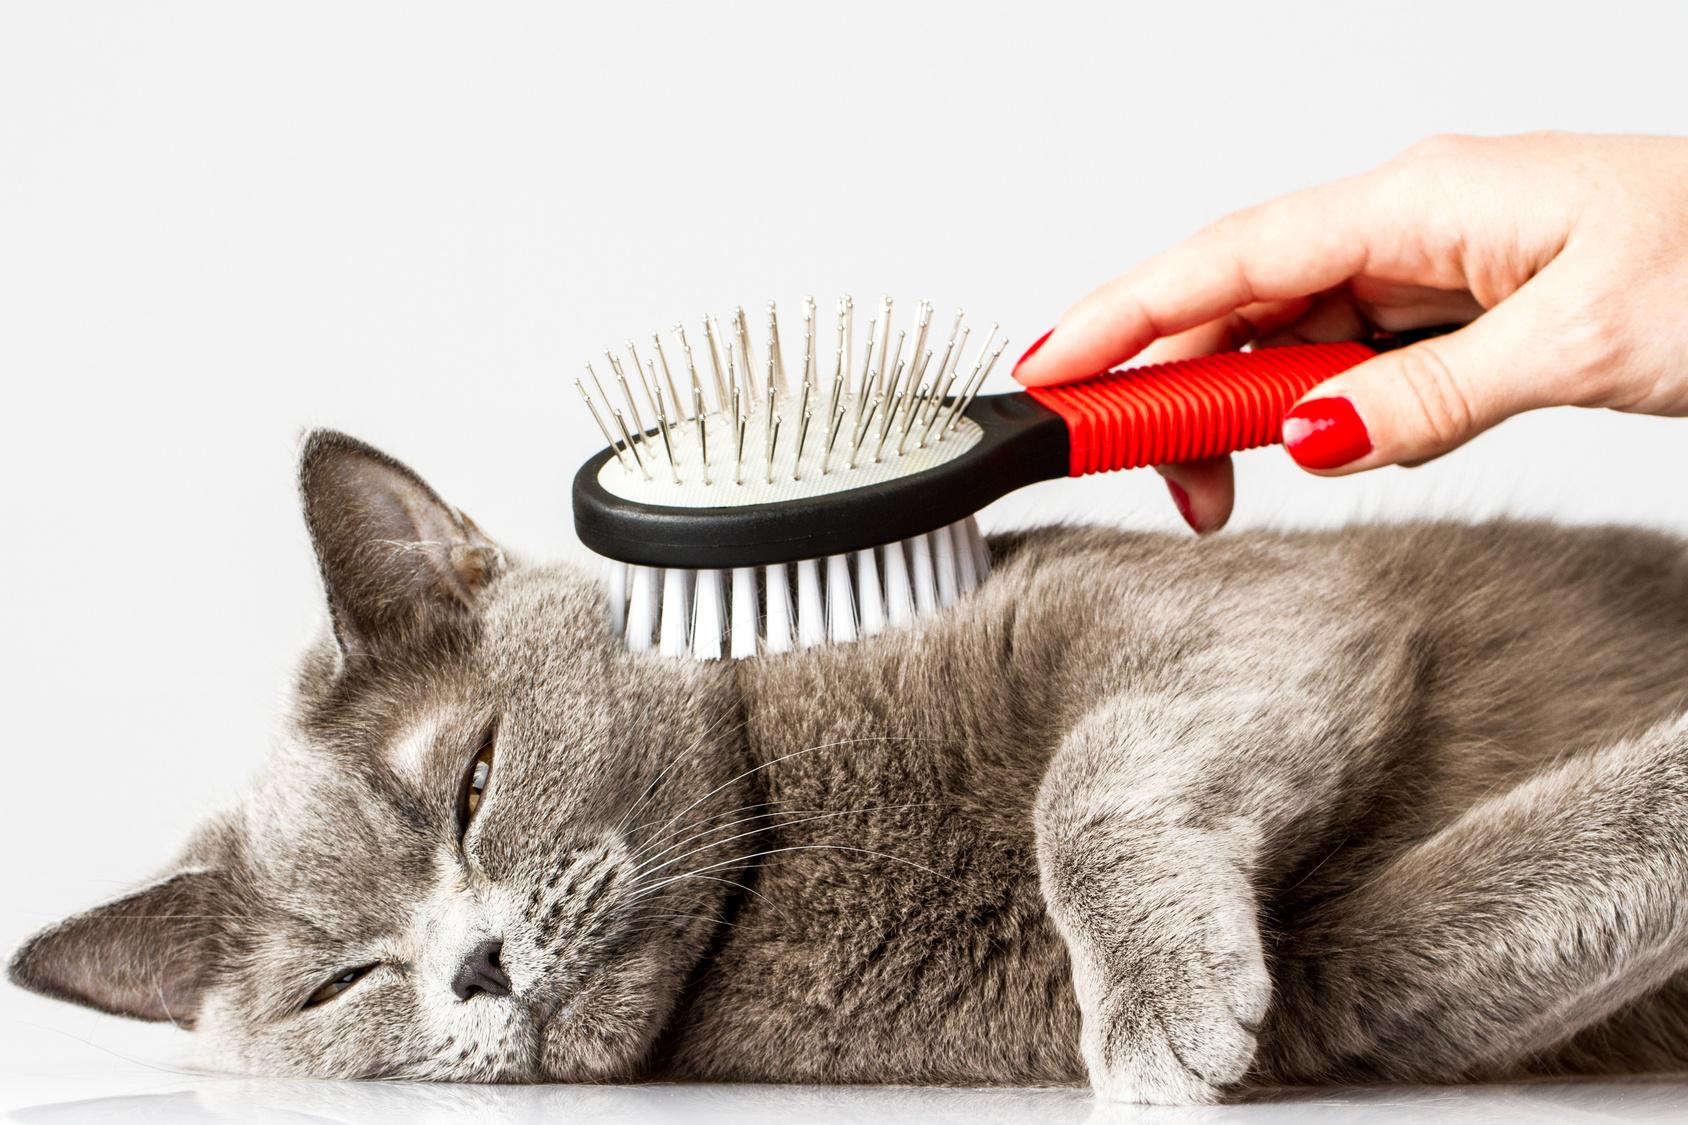 sköldkörtelproblem katt symptom